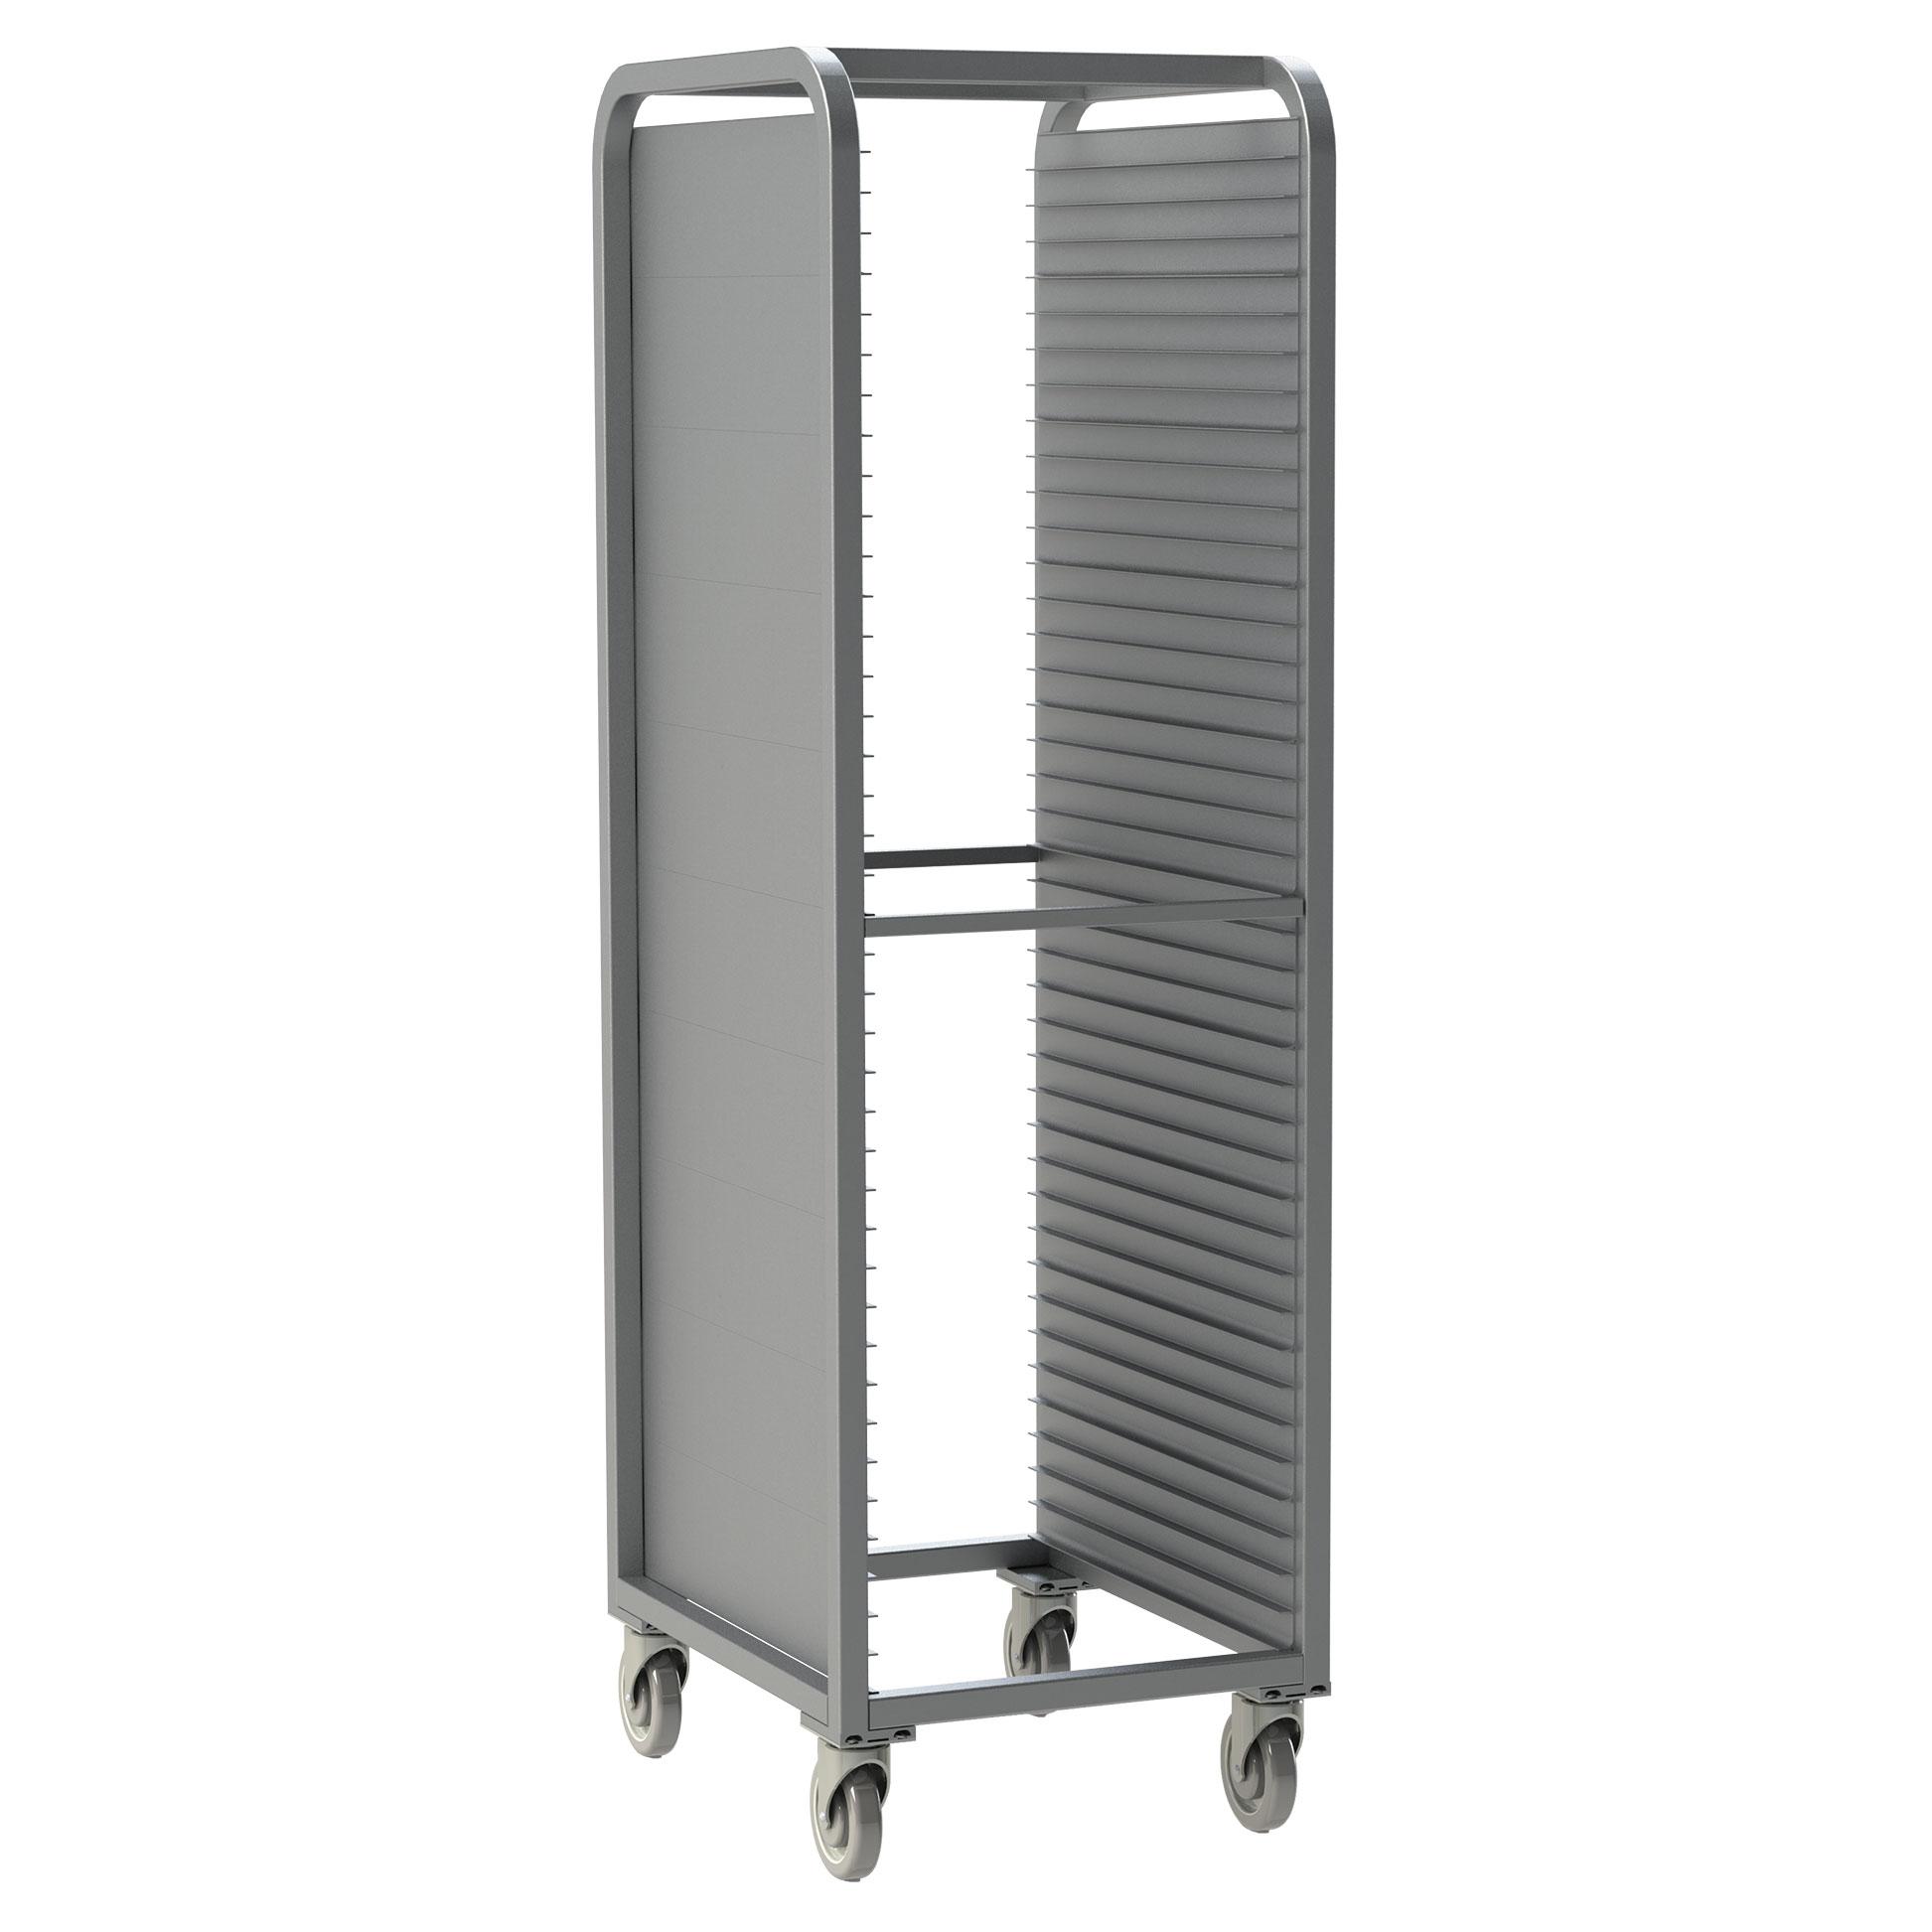 CCSRE Economy Speed Rack Cabinet | Choice Equipment Company